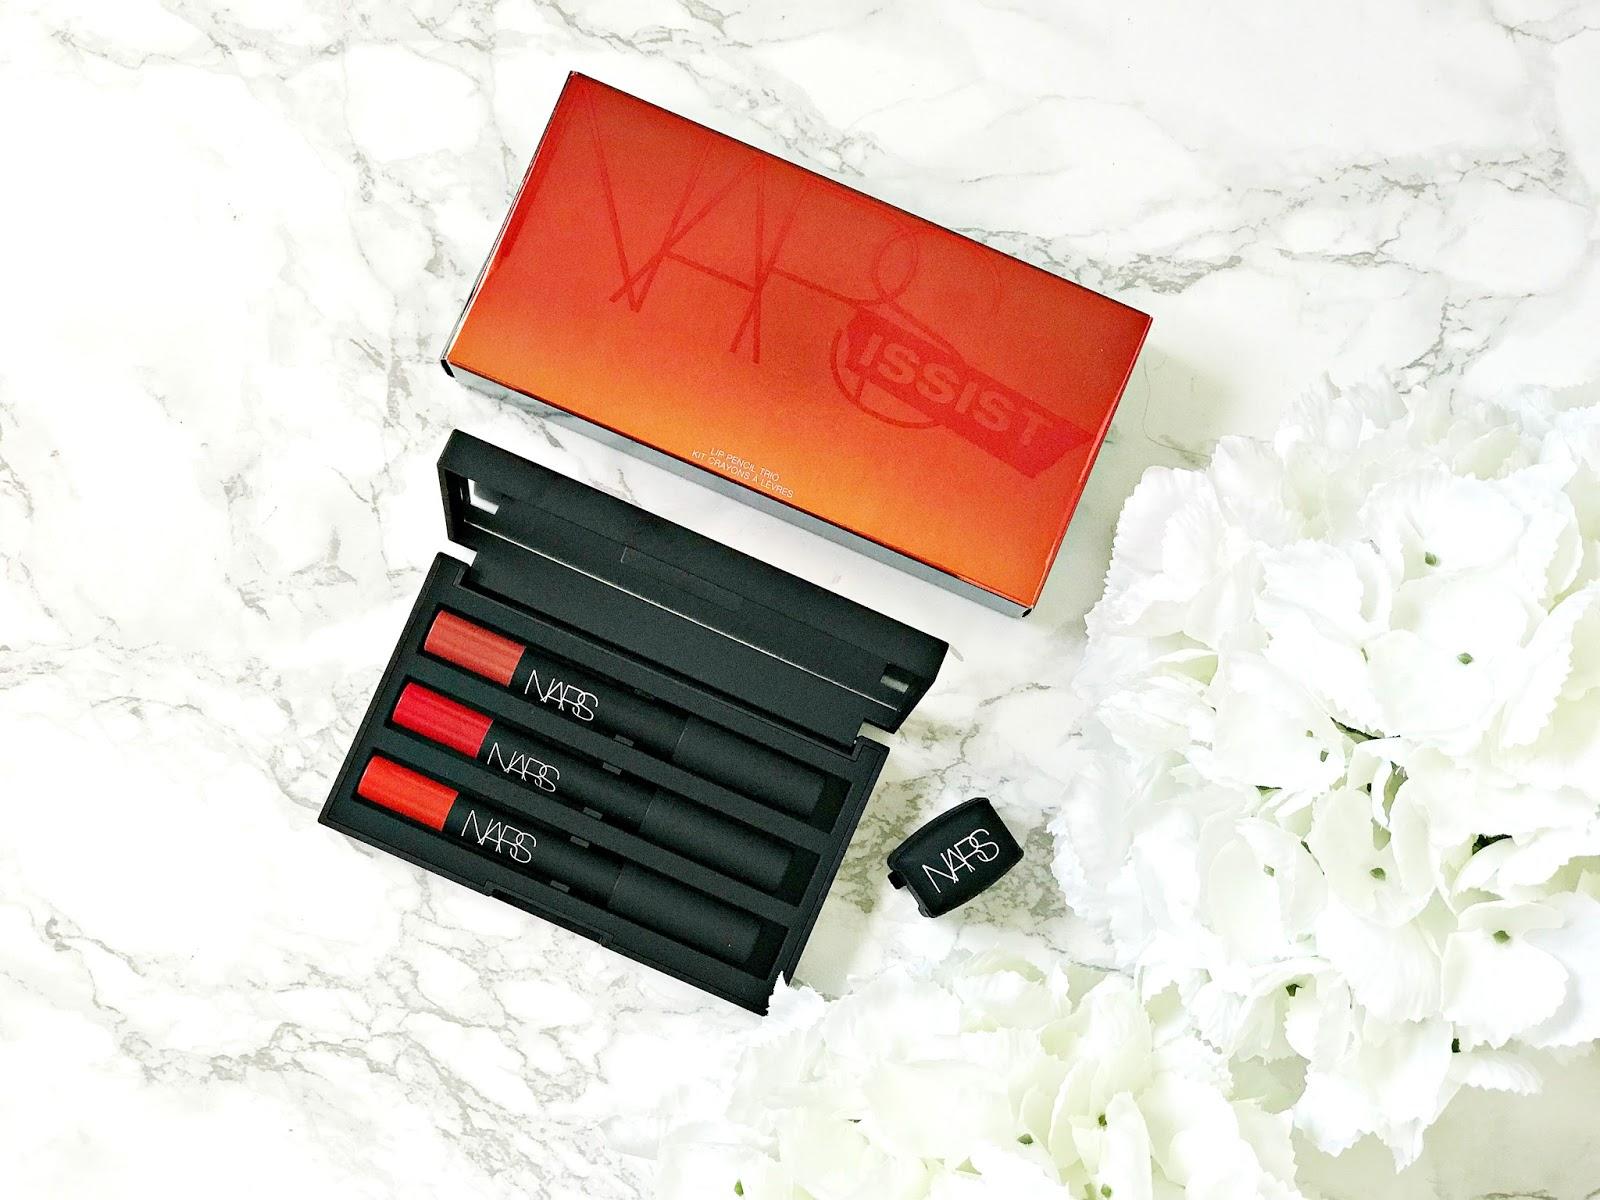 Nars Narsissist Lip Kit Review